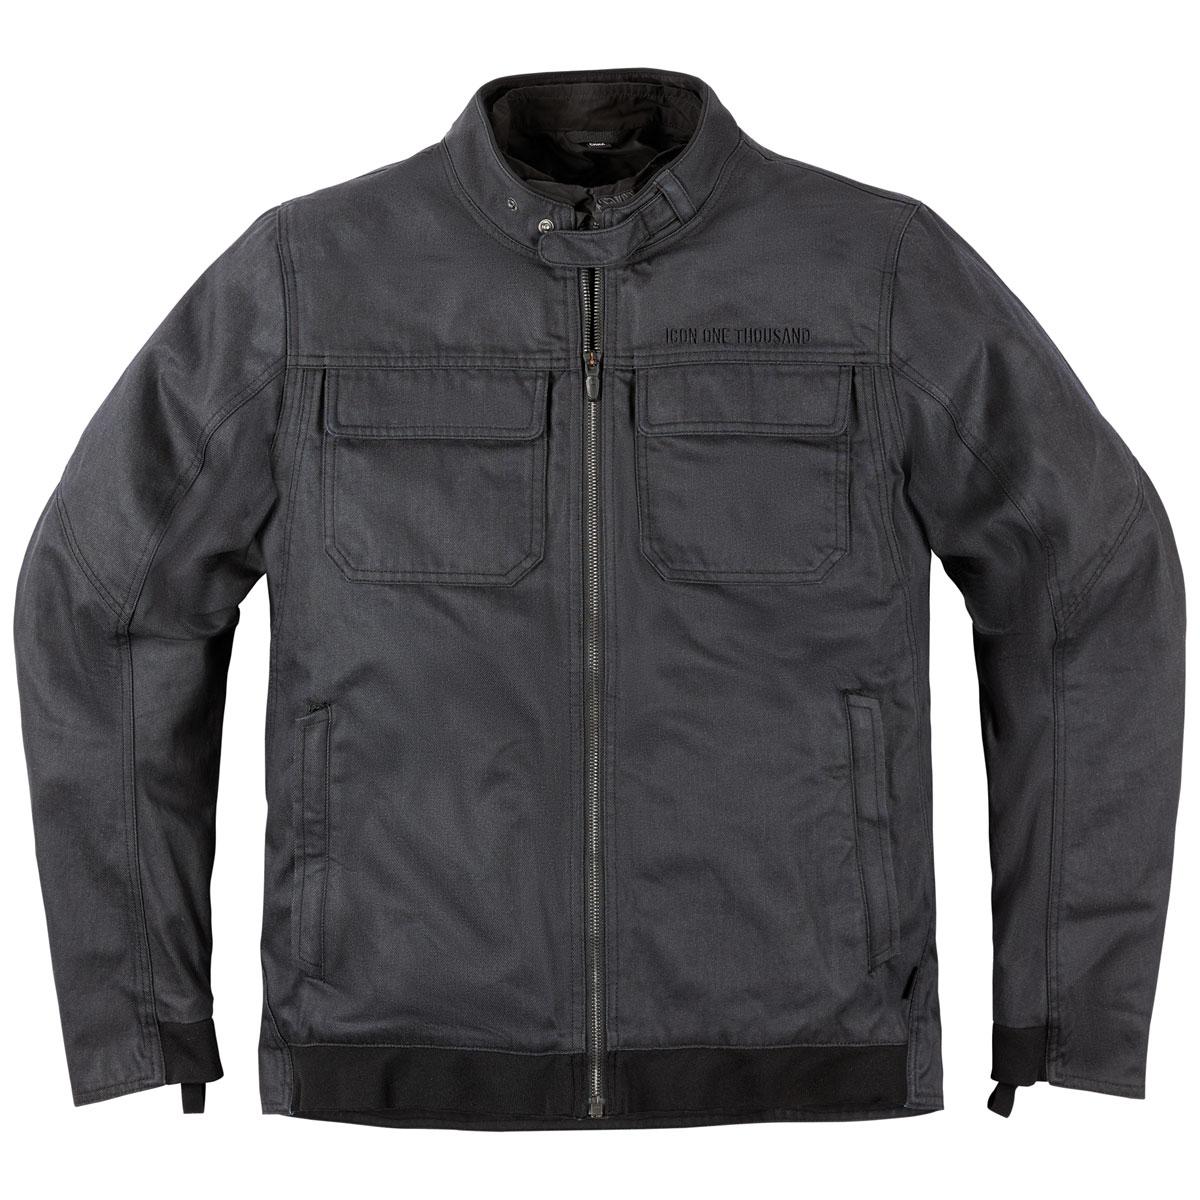 ICON One Thousand Men's Brigand Slate Denim Jacket